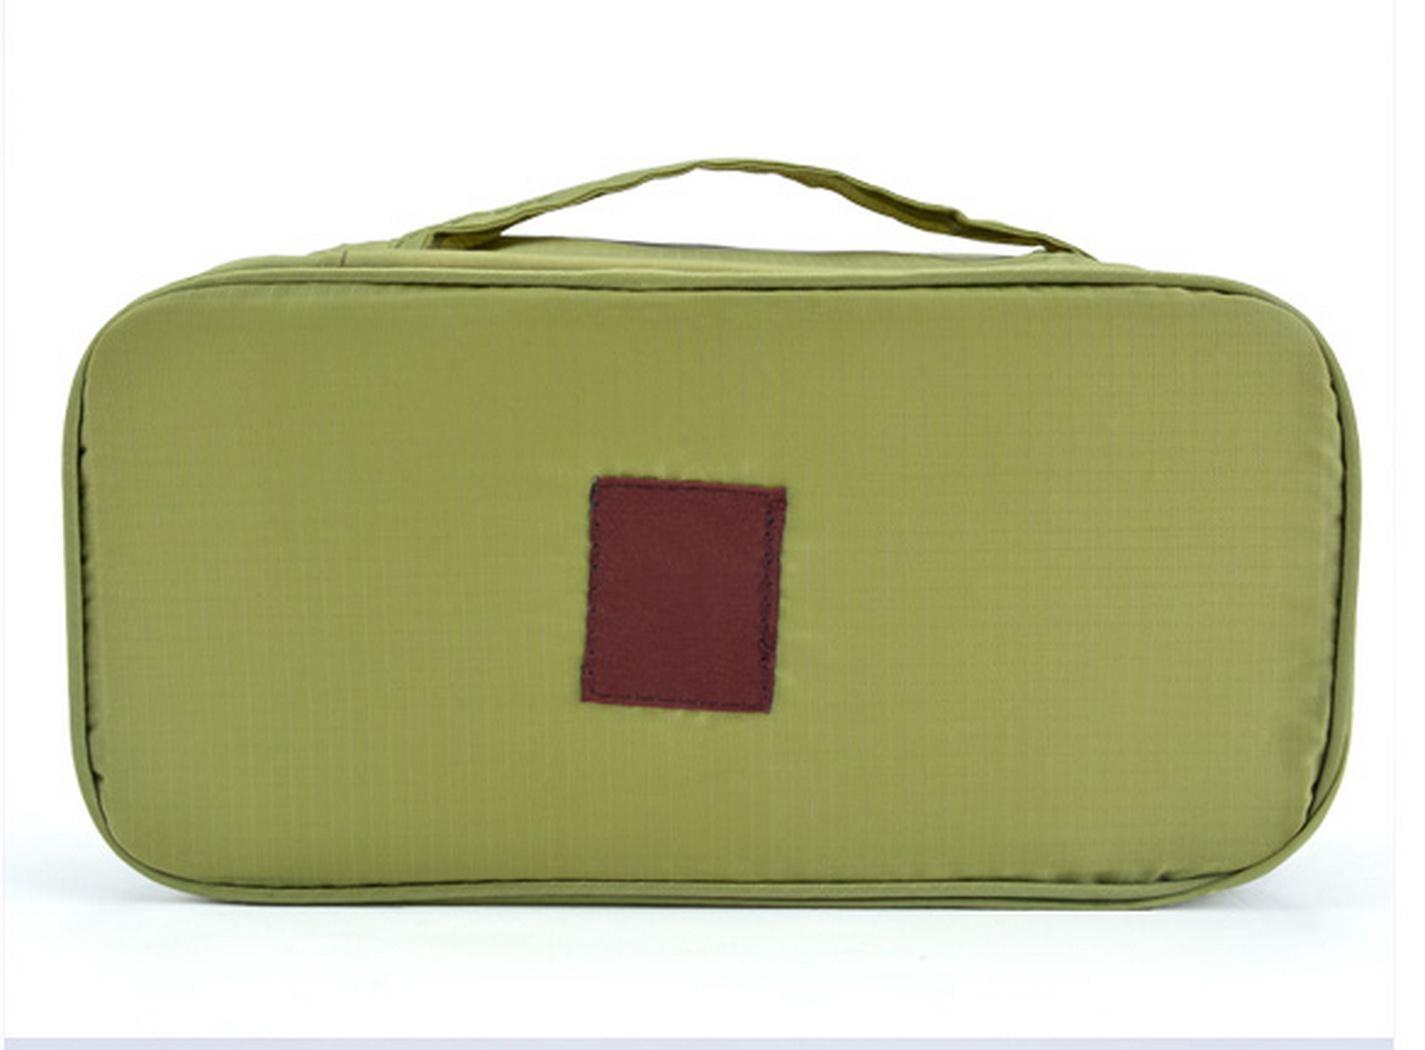 mode sac de voyage multifonction sac de transport sac cosm tique toilette sous v tements sac. Black Bedroom Furniture Sets. Home Design Ideas